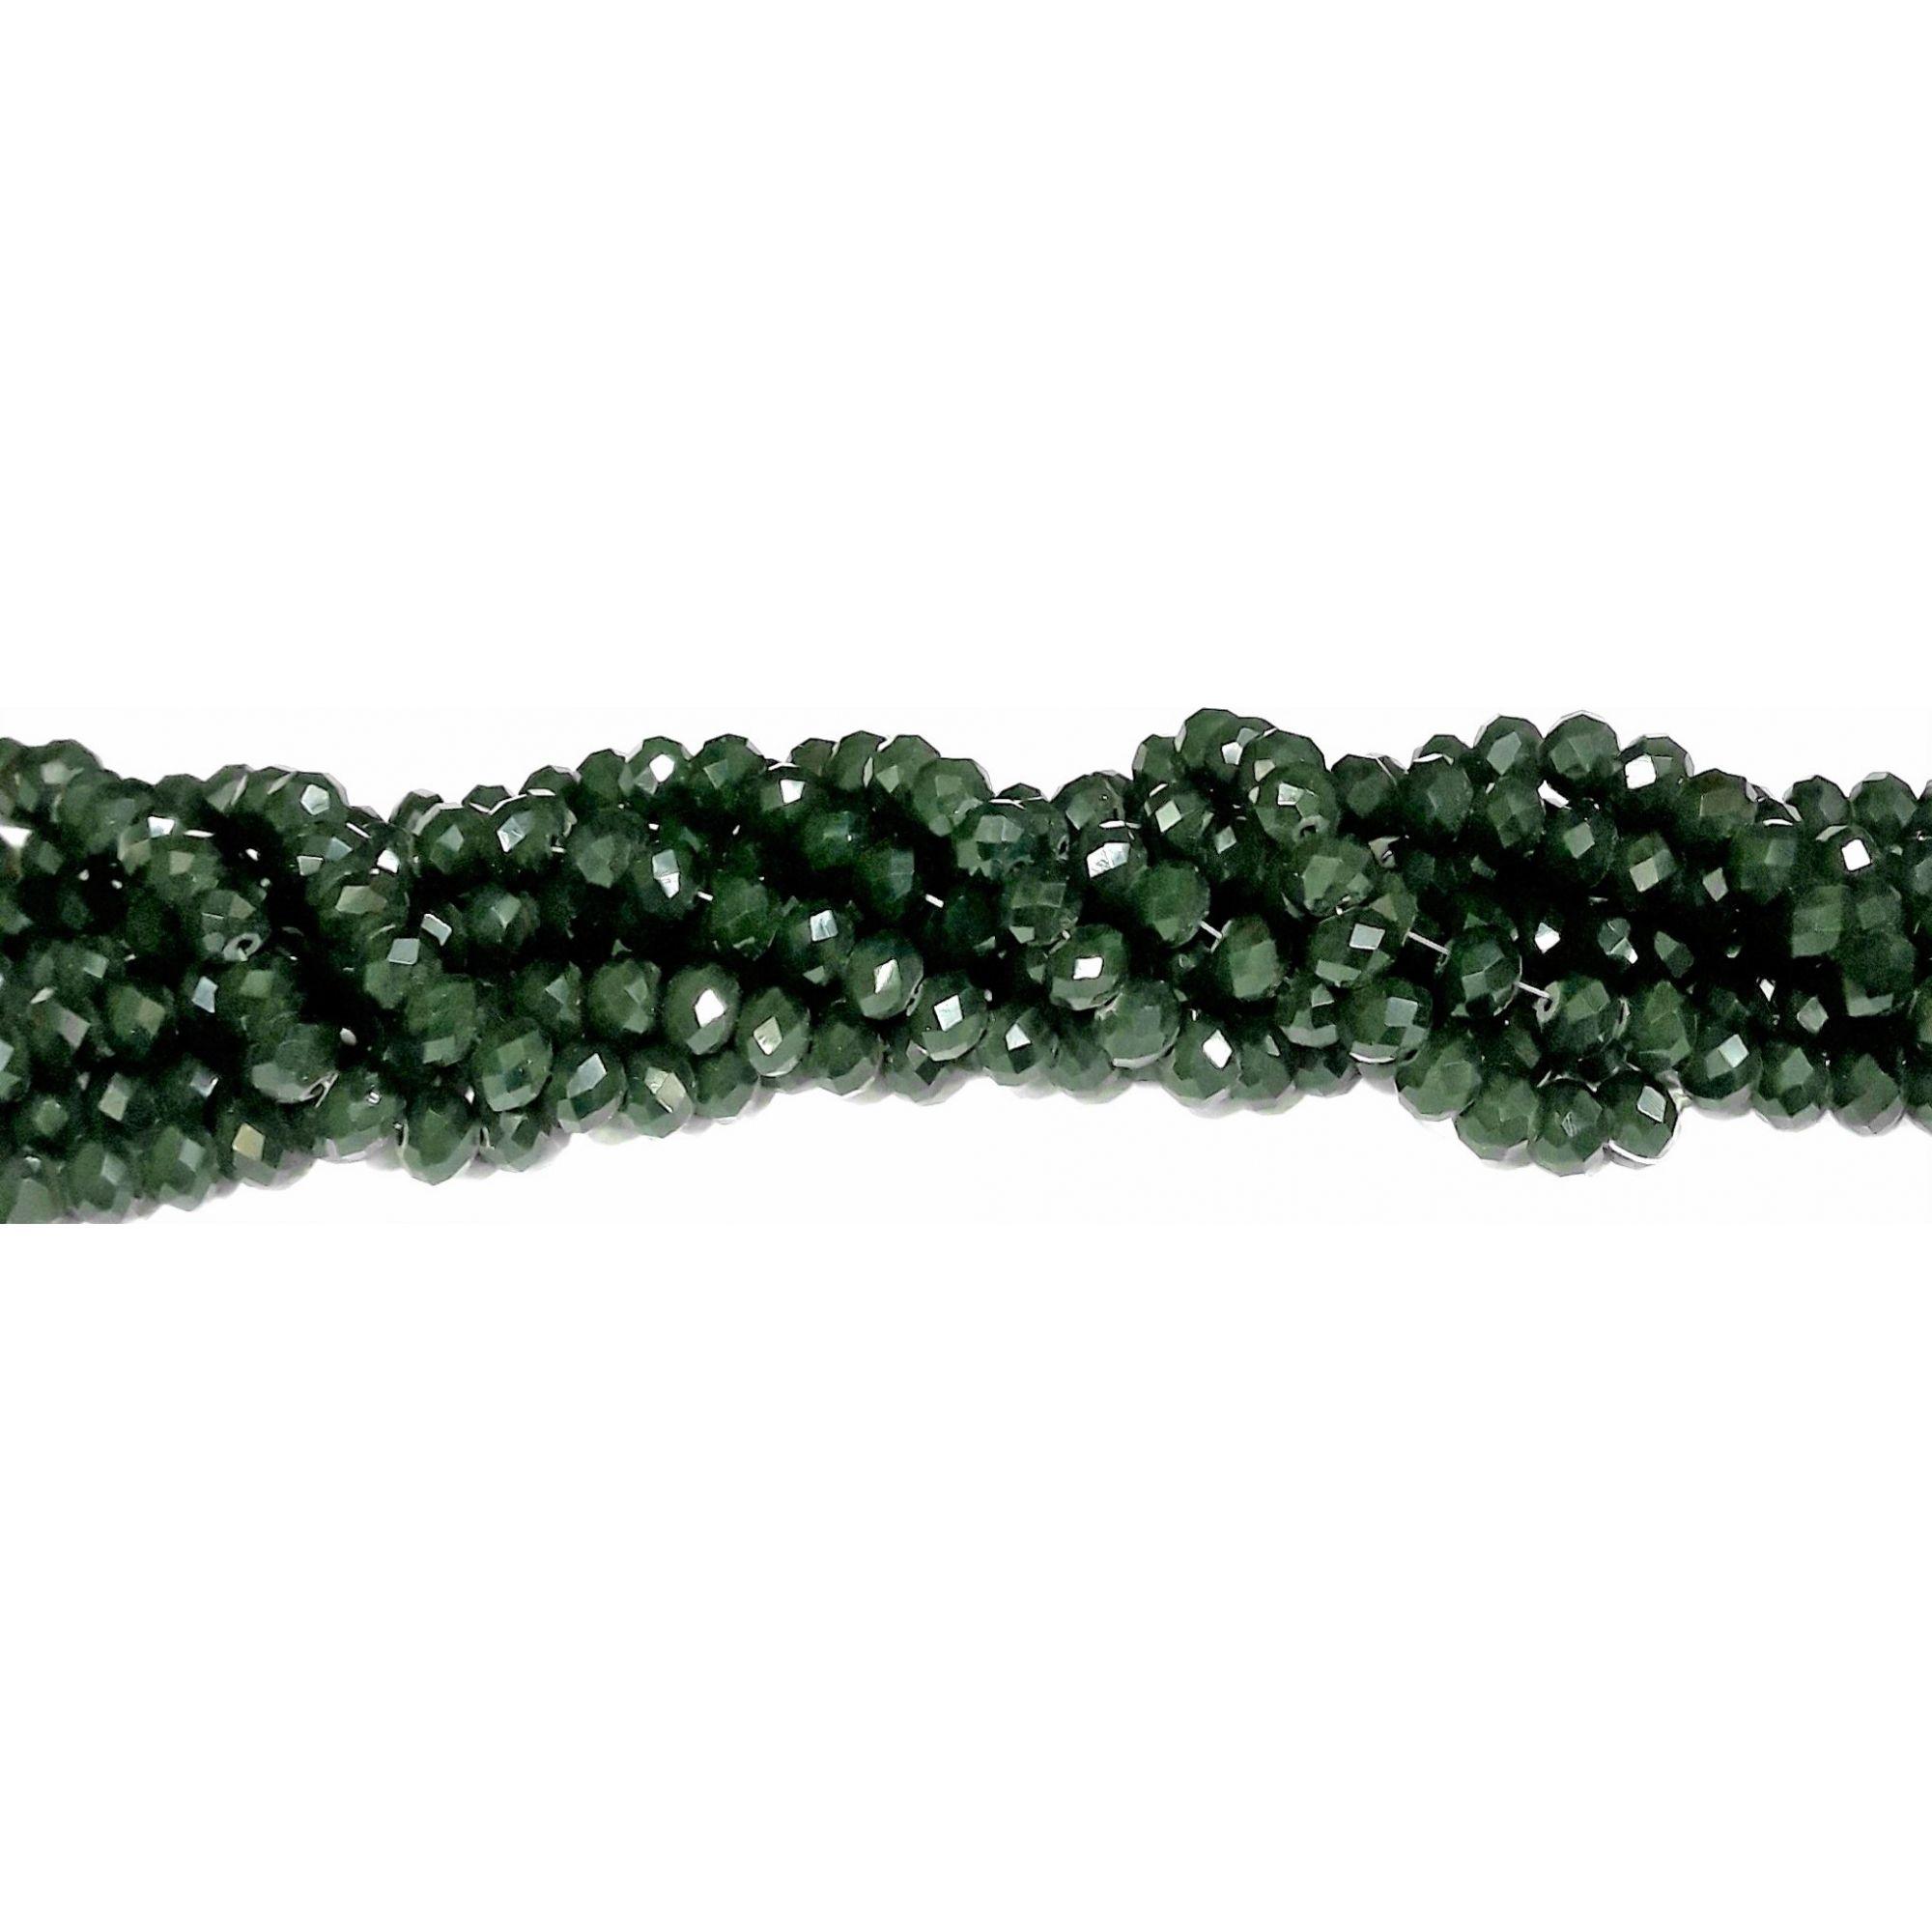 Fio de Cristal 8mm (Verde Militar) - FDC15